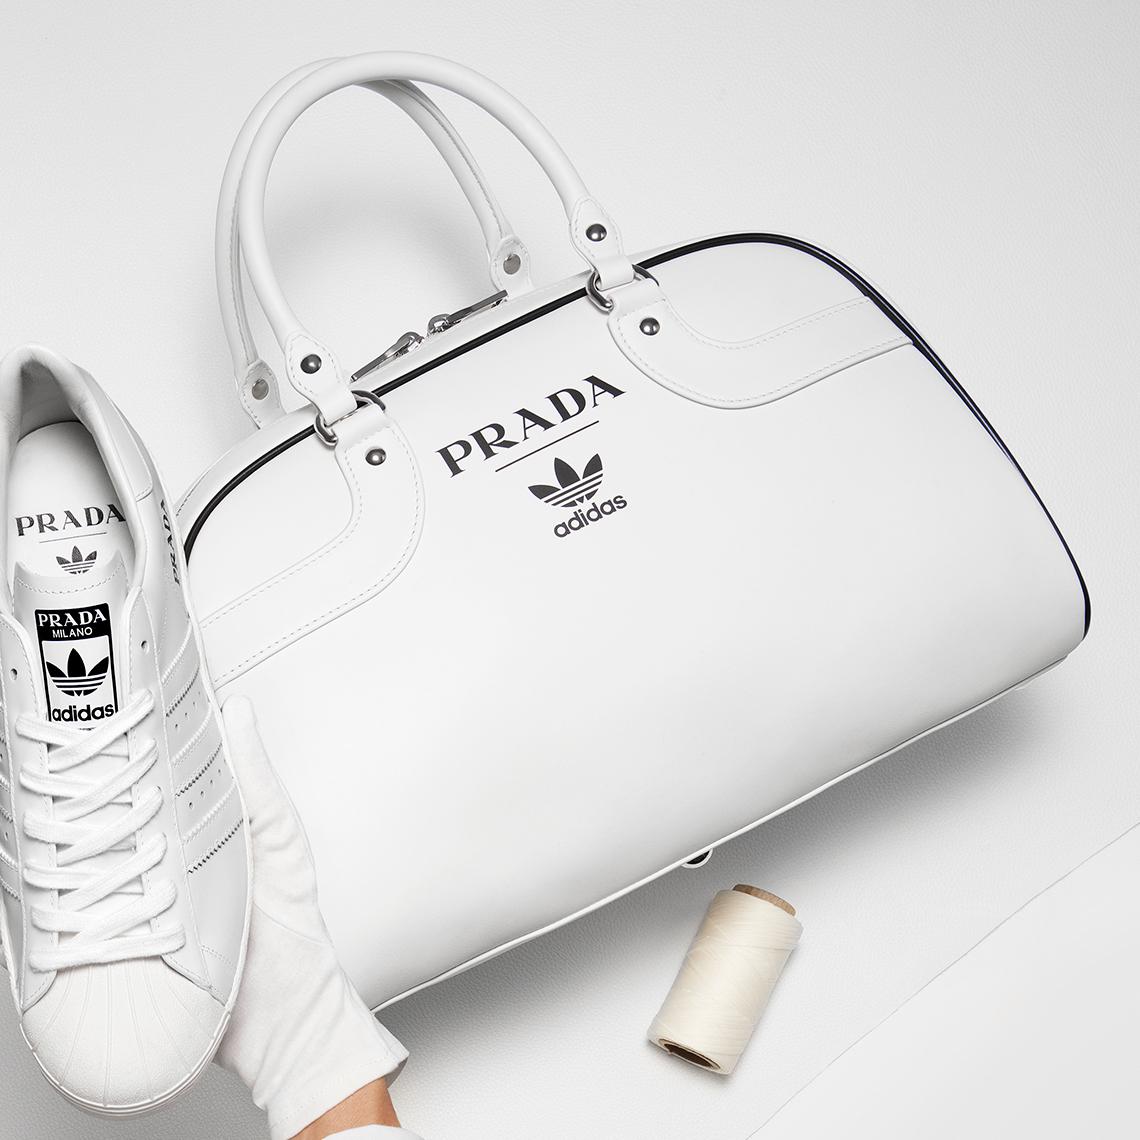 Prada adidas Superstar Release Date  